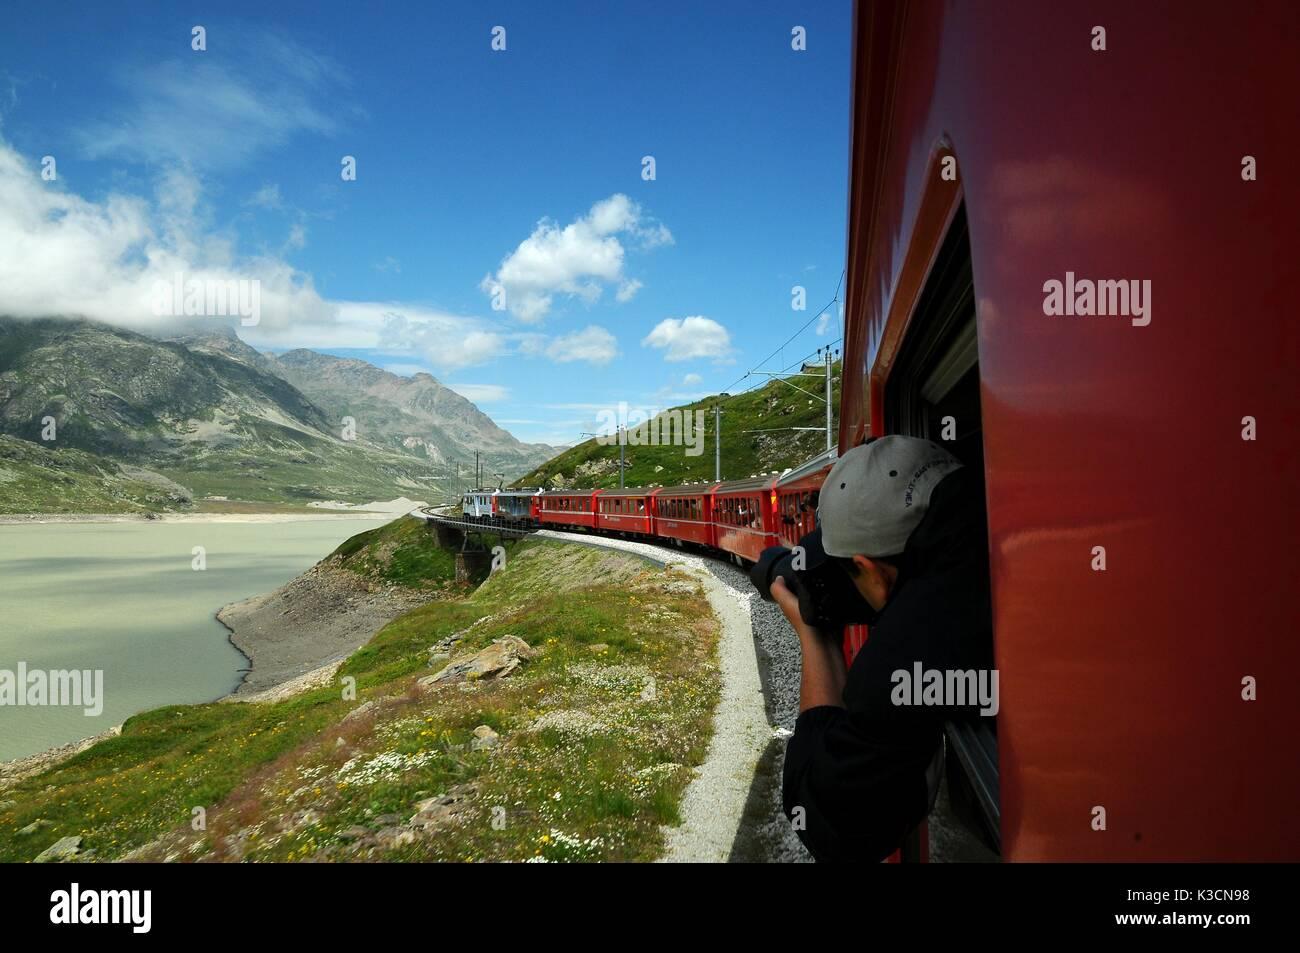 Famous red alpine train Bernina Express from St.Moritz to Tirano passing the Blanc Lake at Bernina Pass in Switzerland - Stock Image